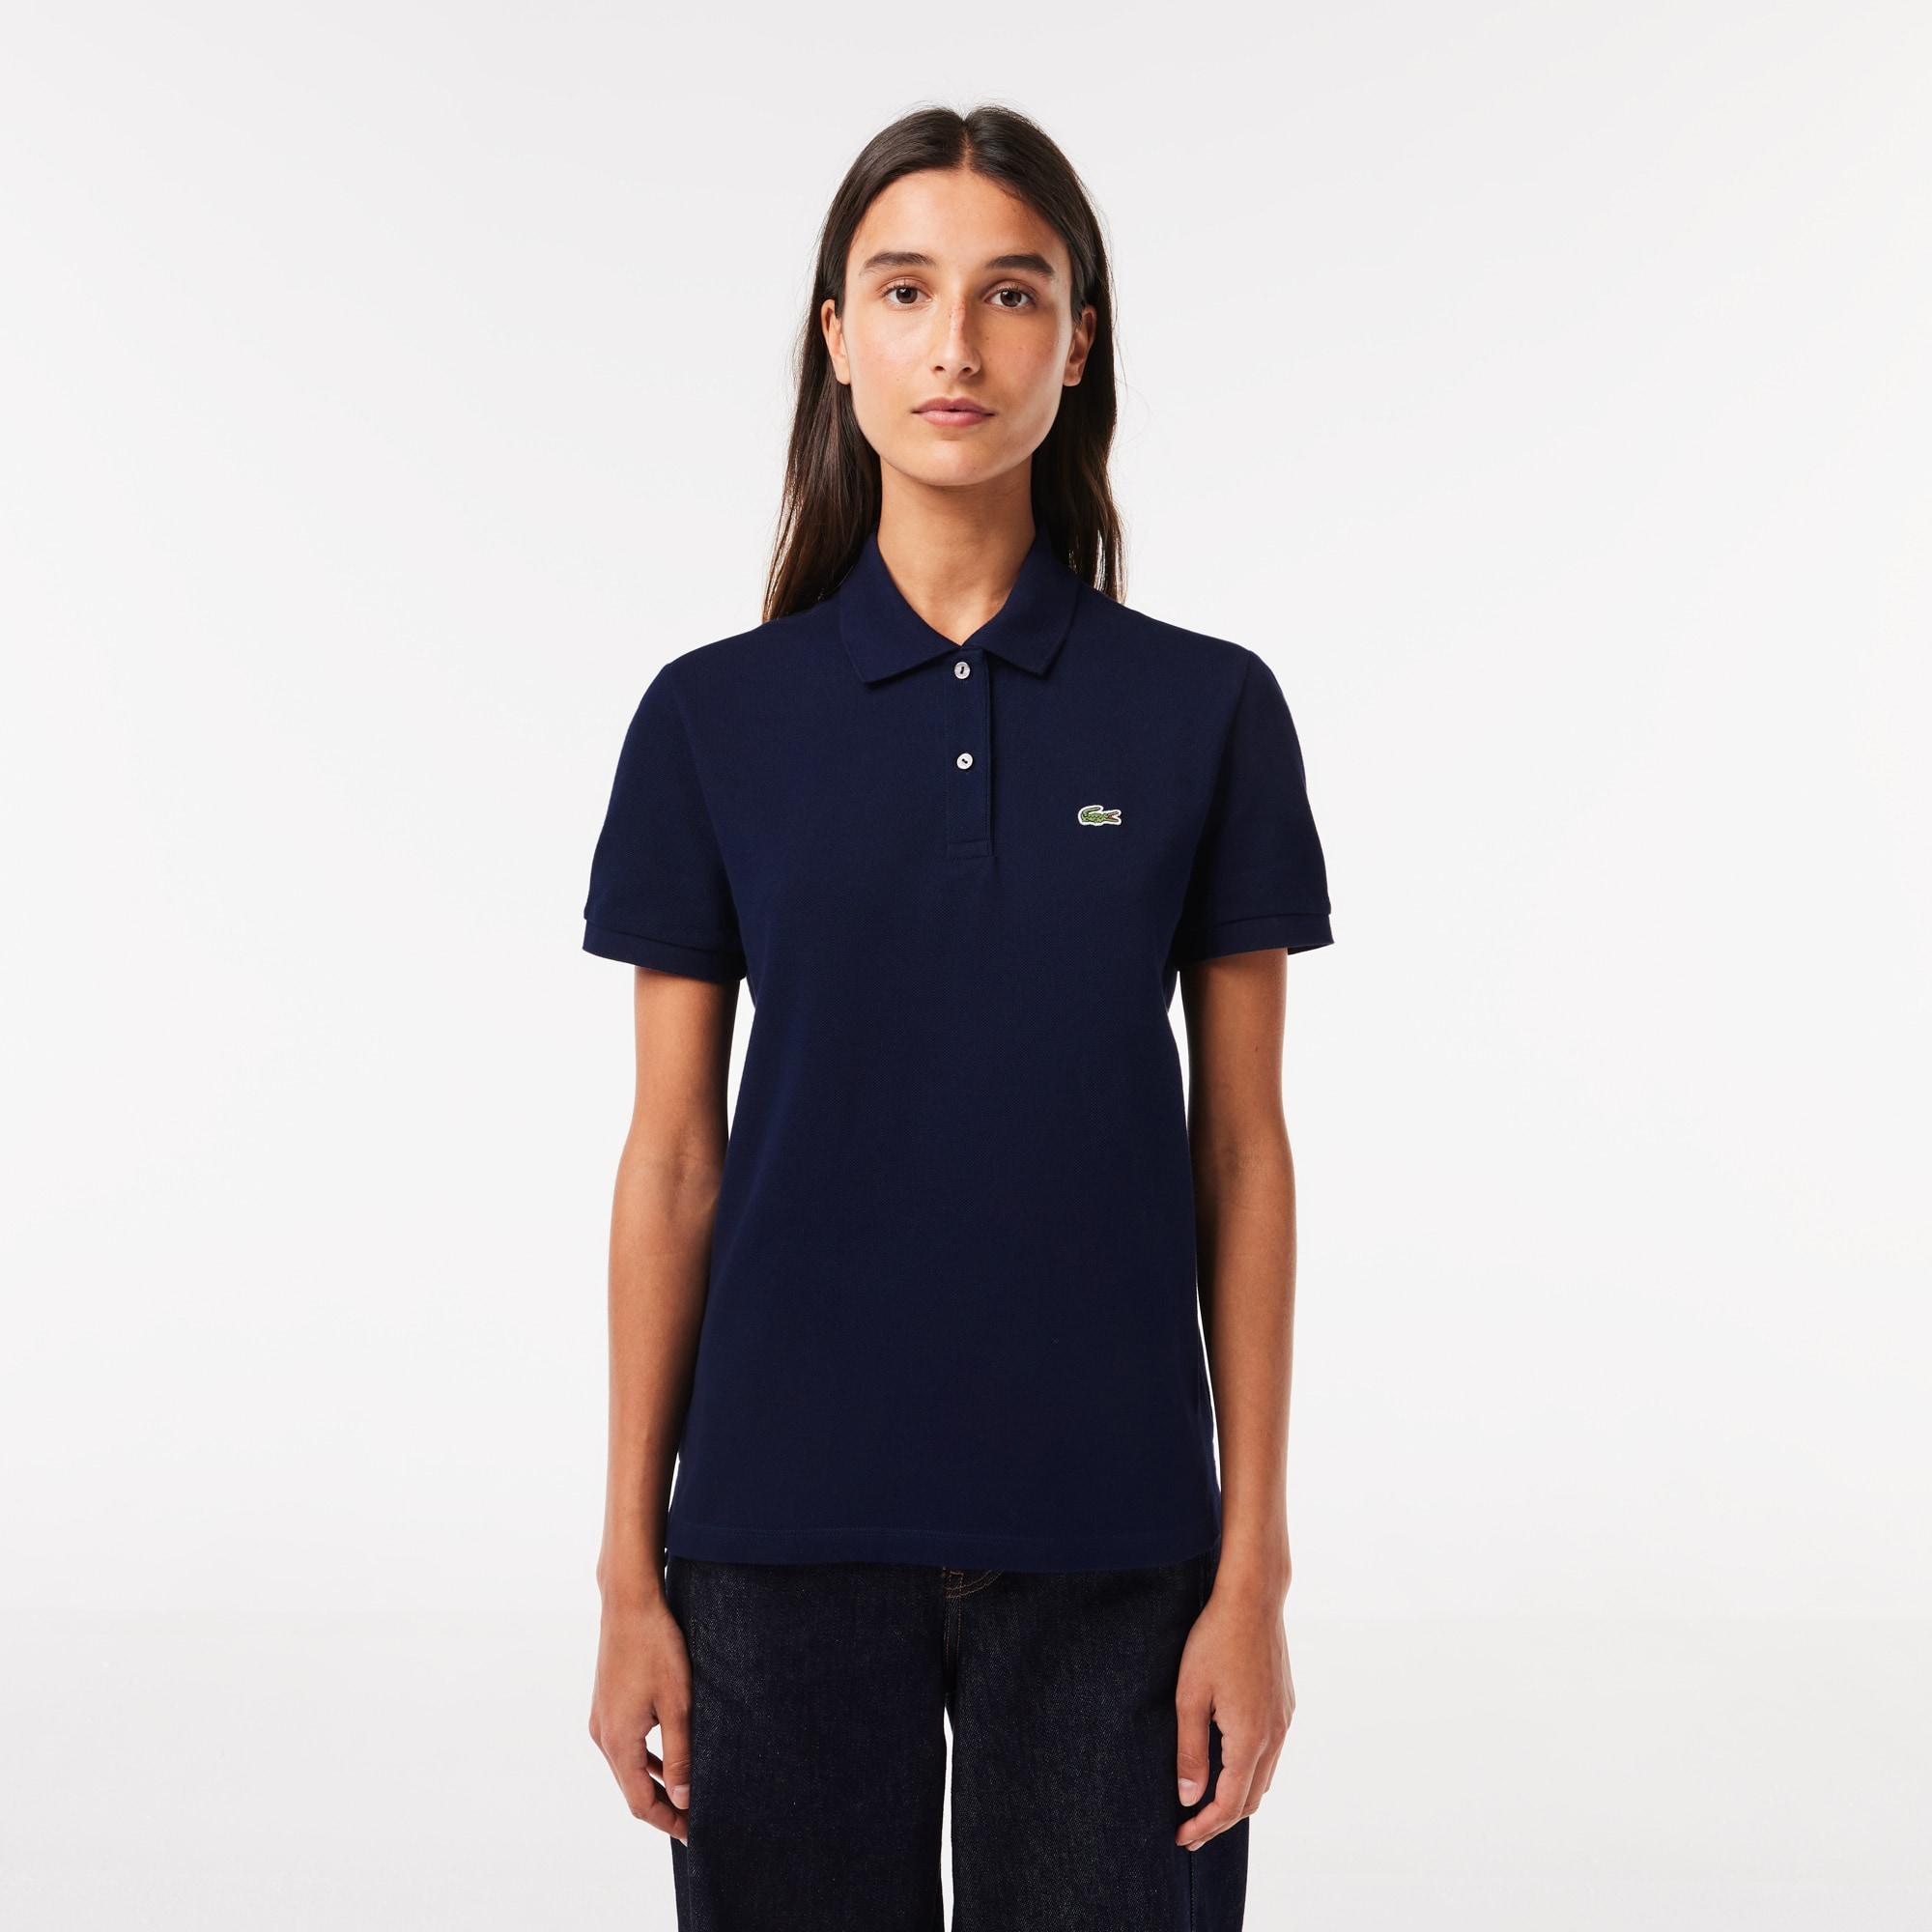 amp; Women Lacoste Sleeves Long Shirts Sleeveless For Polo FE8qaXw